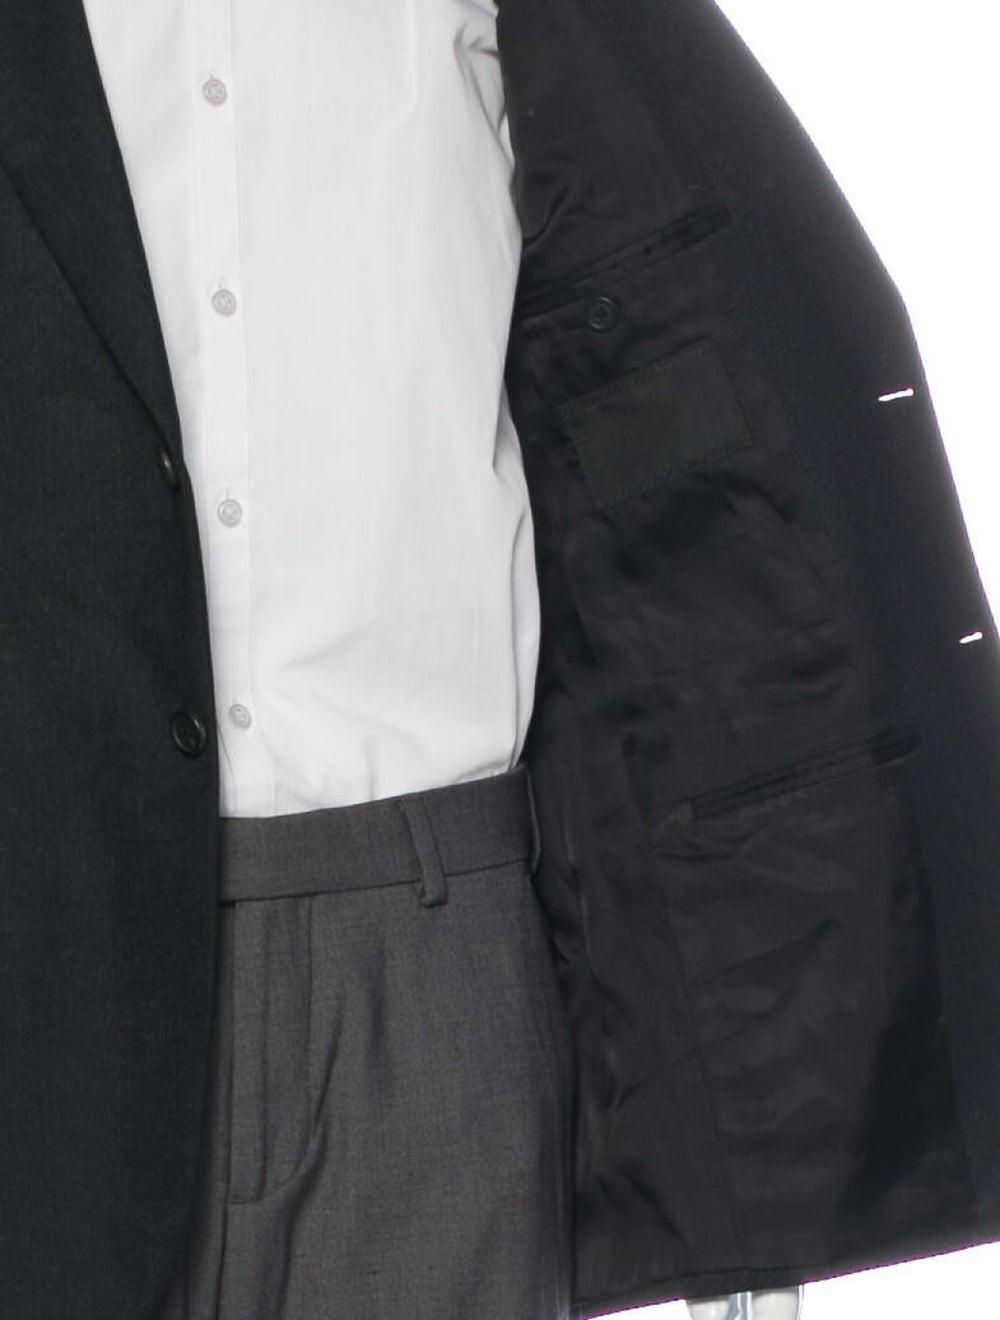 Prada Wool Blazer Wool - image 4